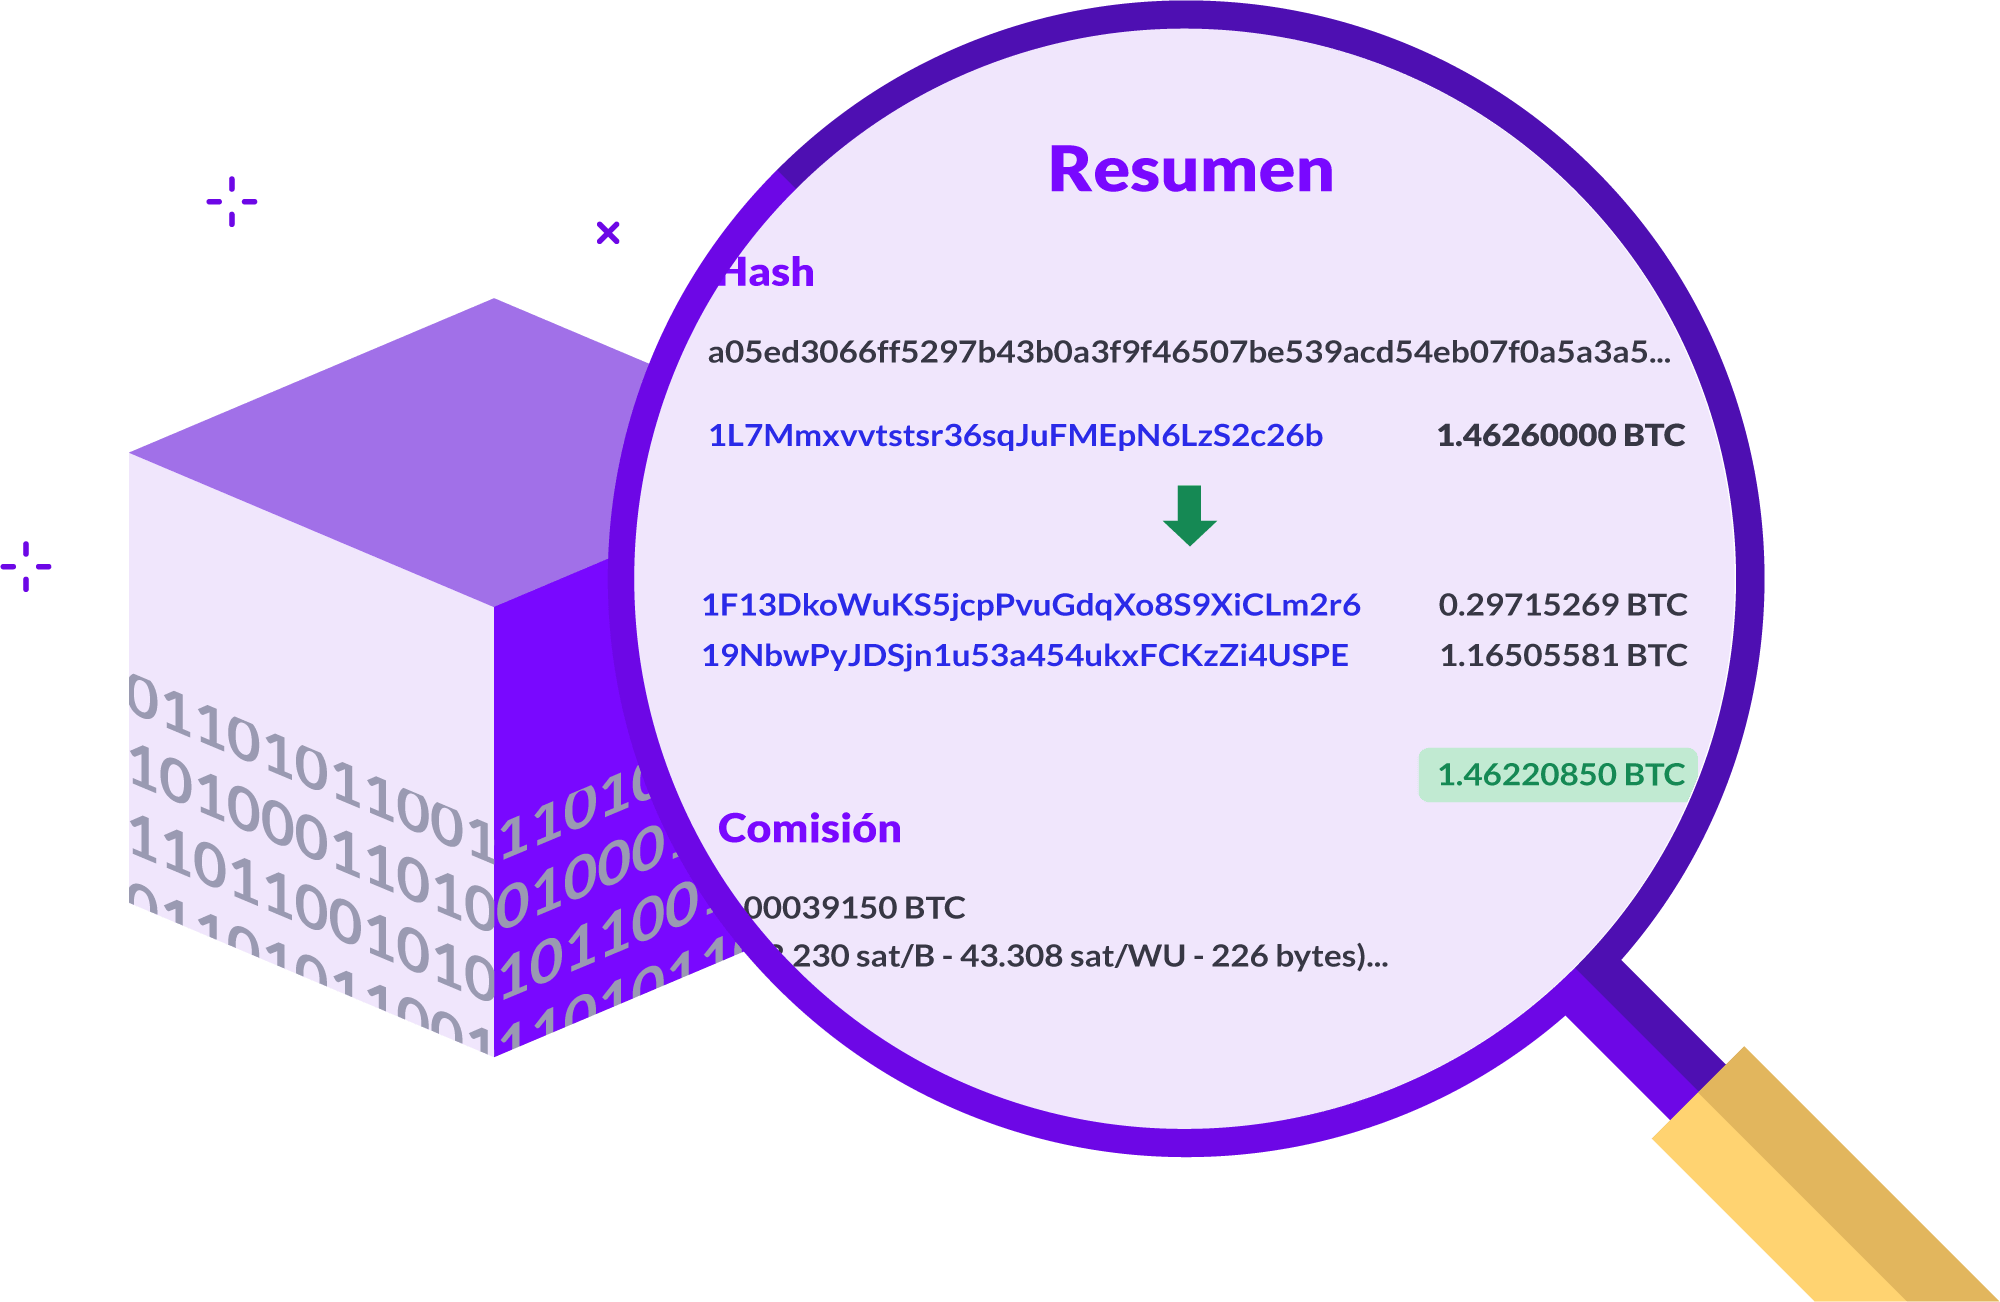 Cómo se explora la blockchain